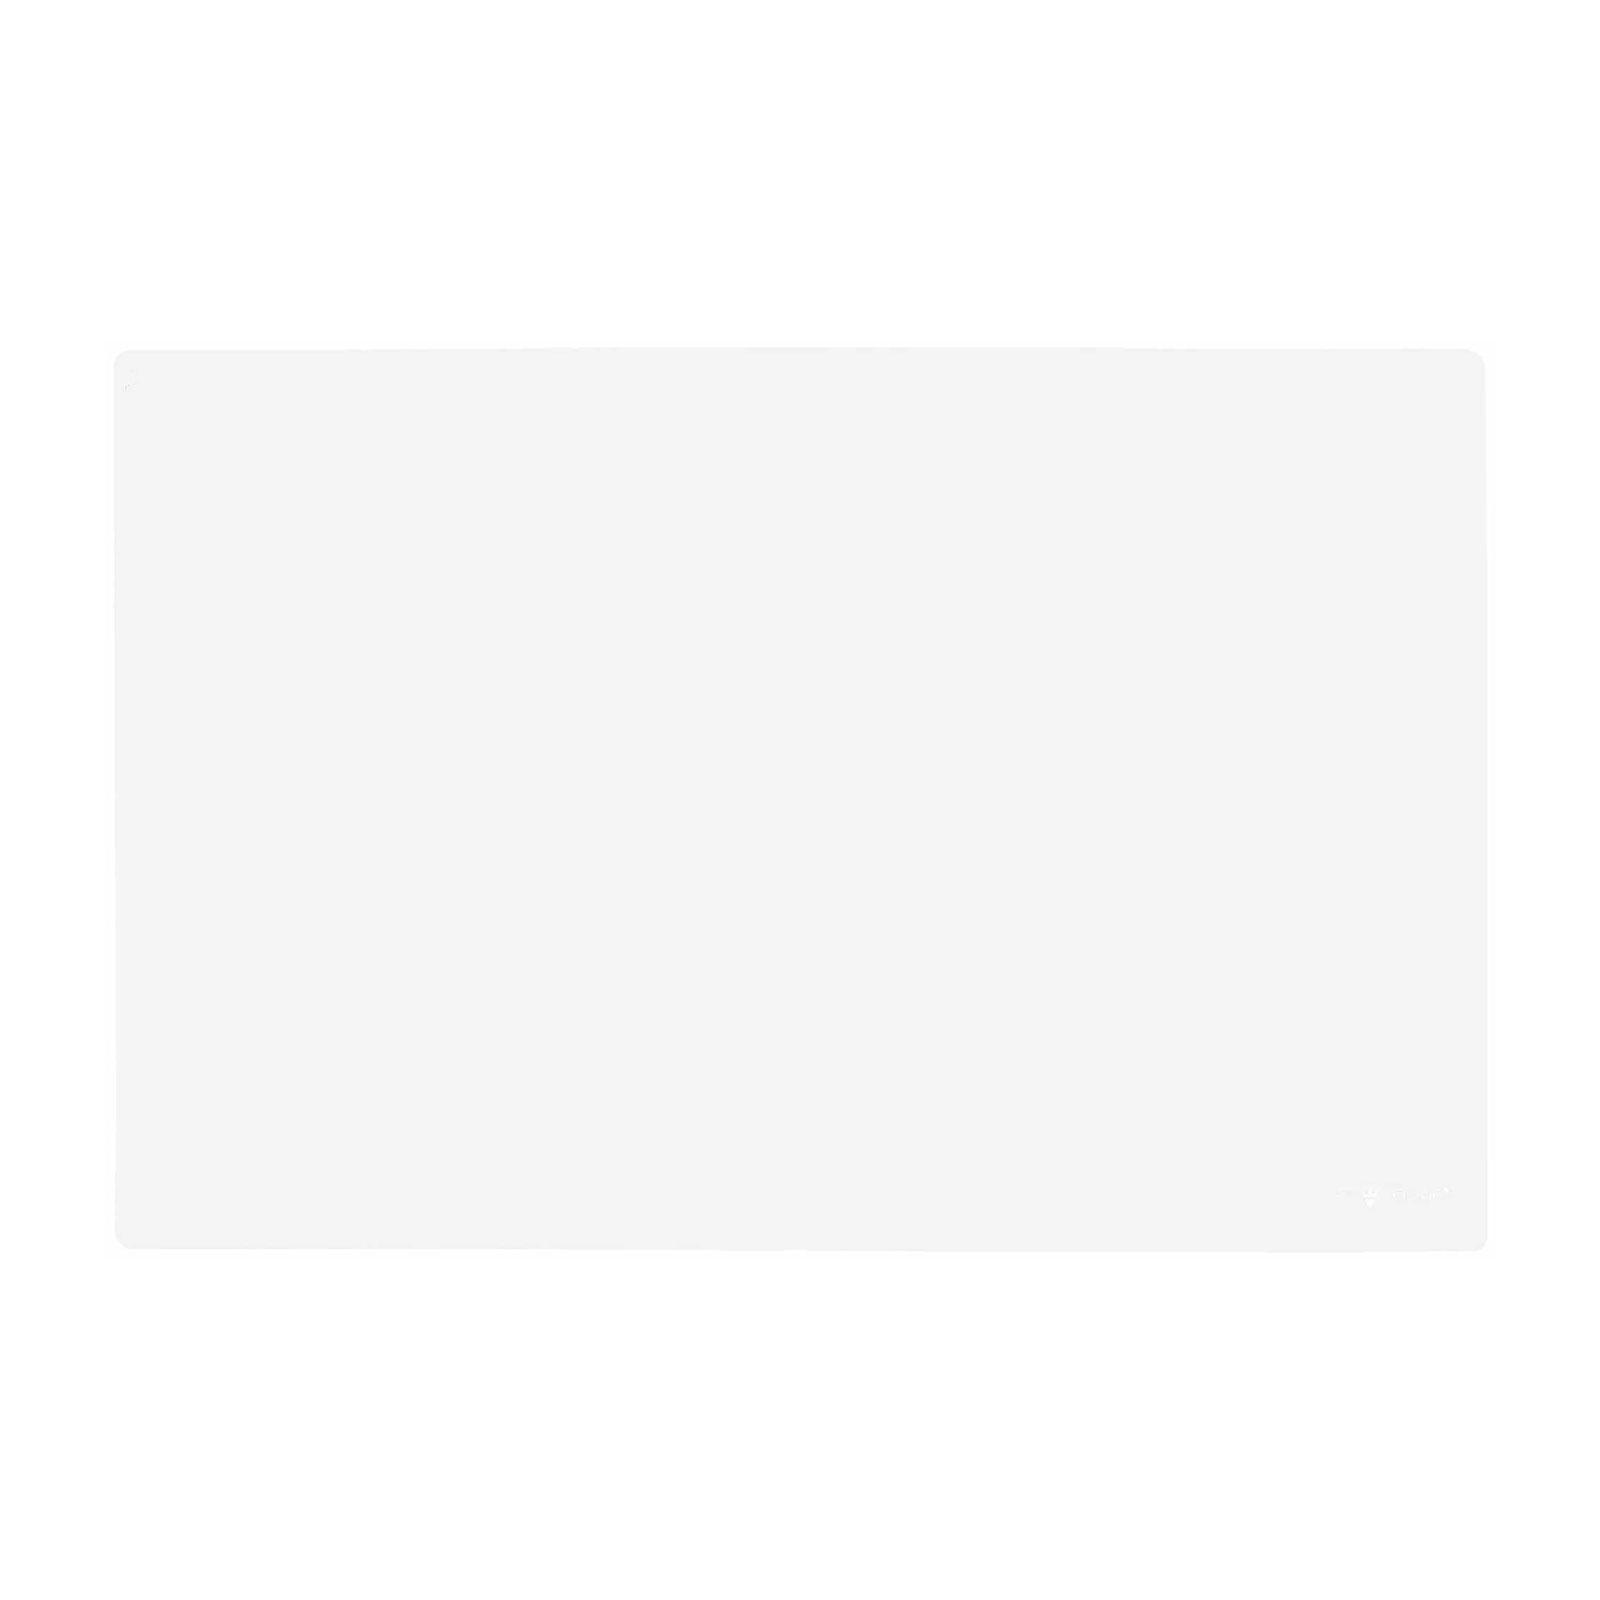 Доска для лепки Silwerhof Emotions пластиковая белая А3